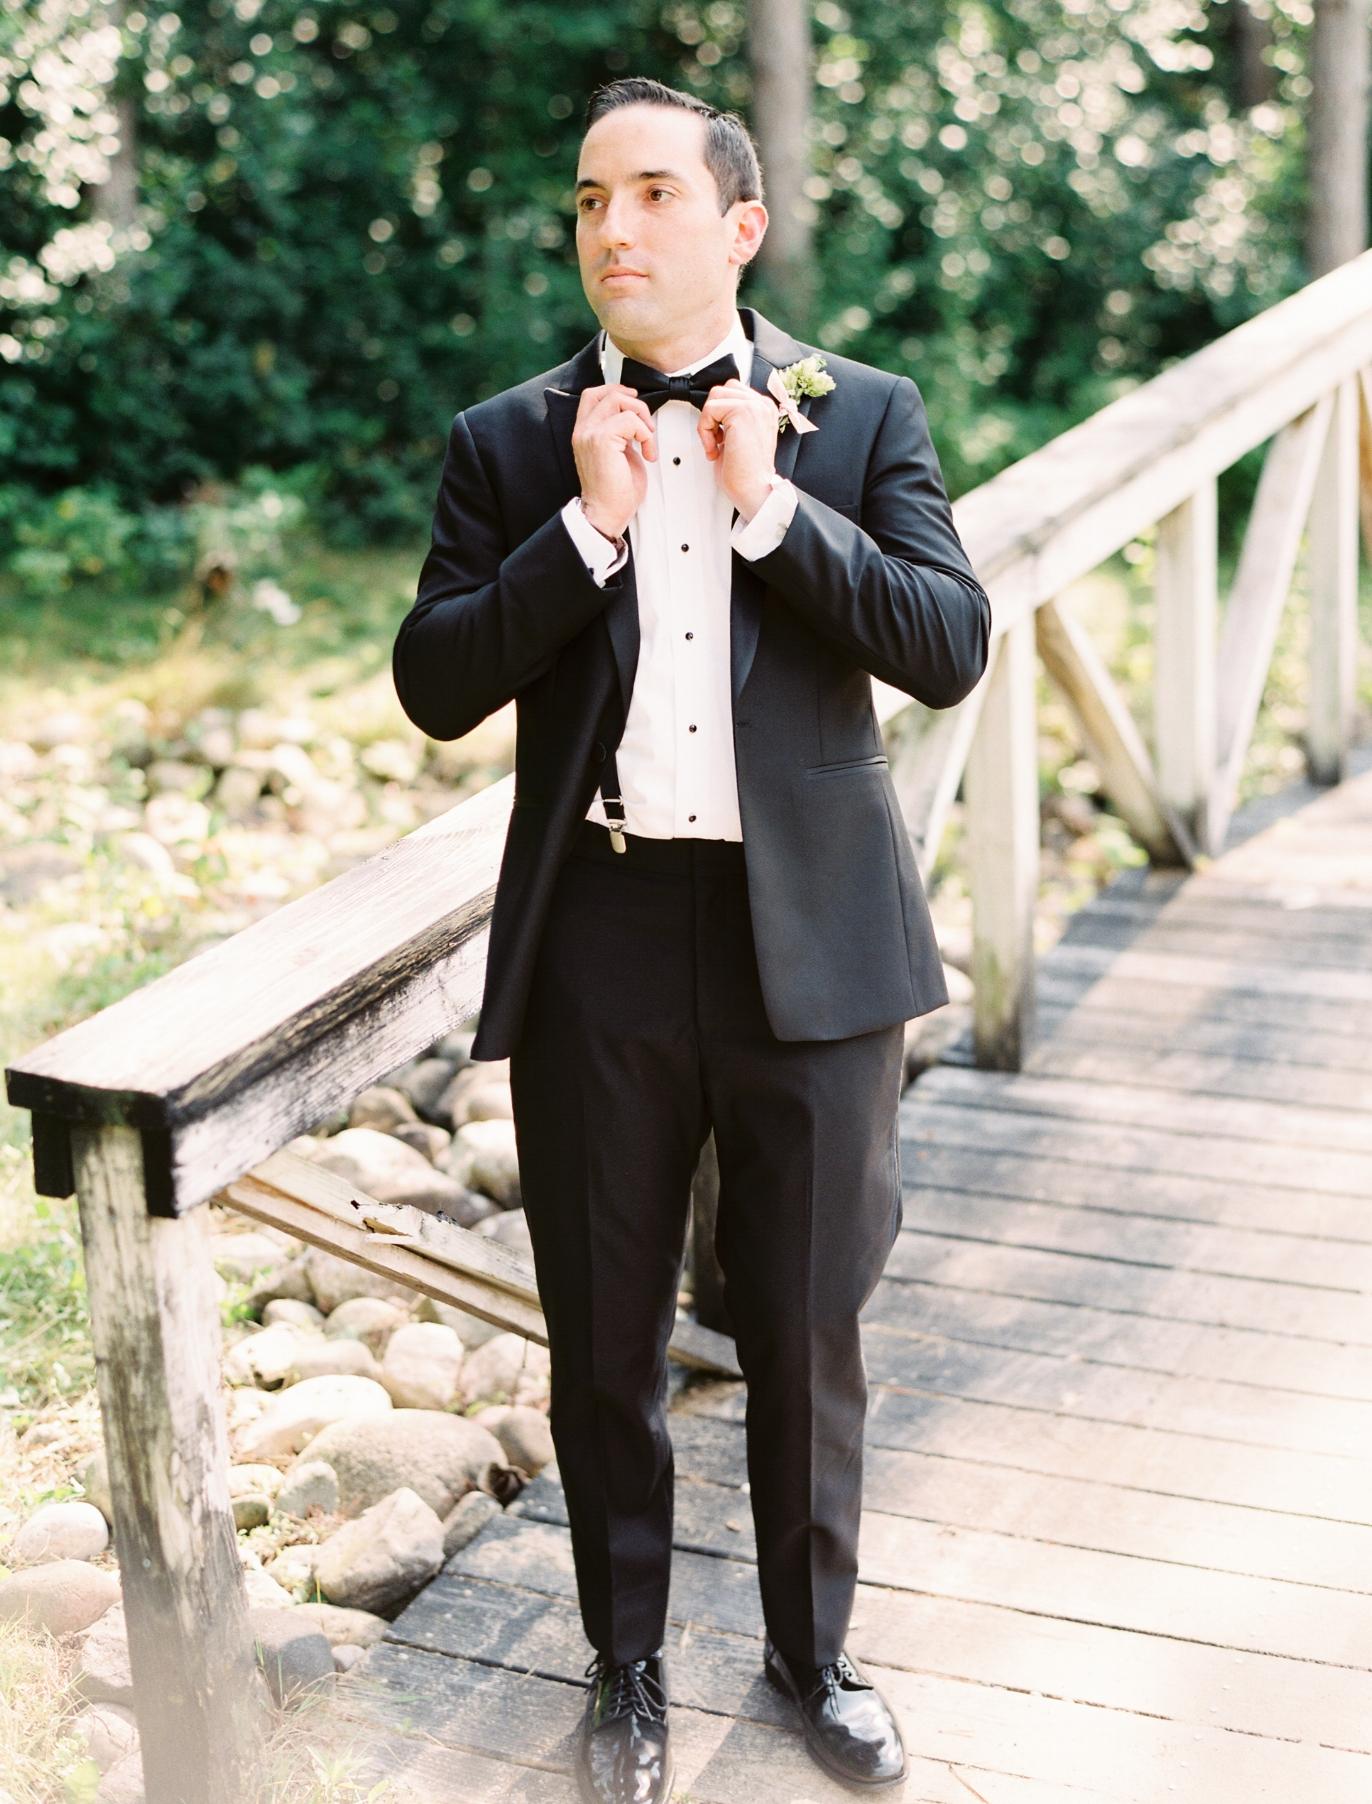 Zoller+Wedding+Bridal+Partyf-40.jpg